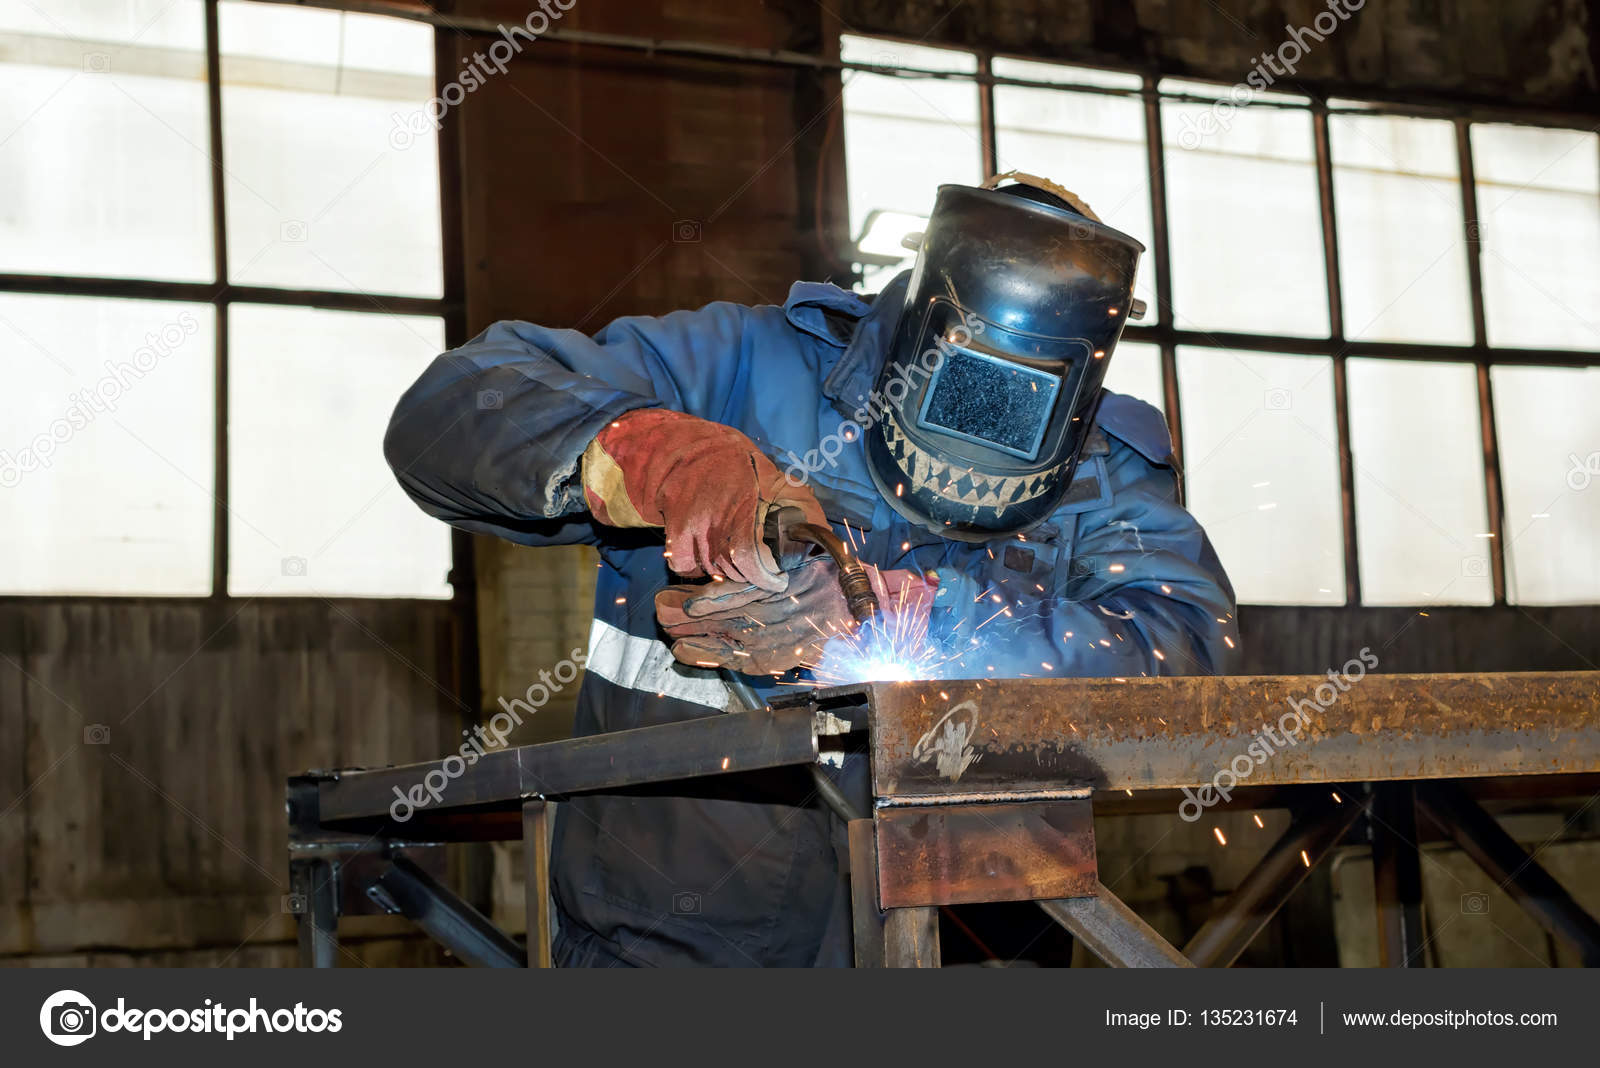 Welding semi-automatic for beginners. Semi-automatic welding 11